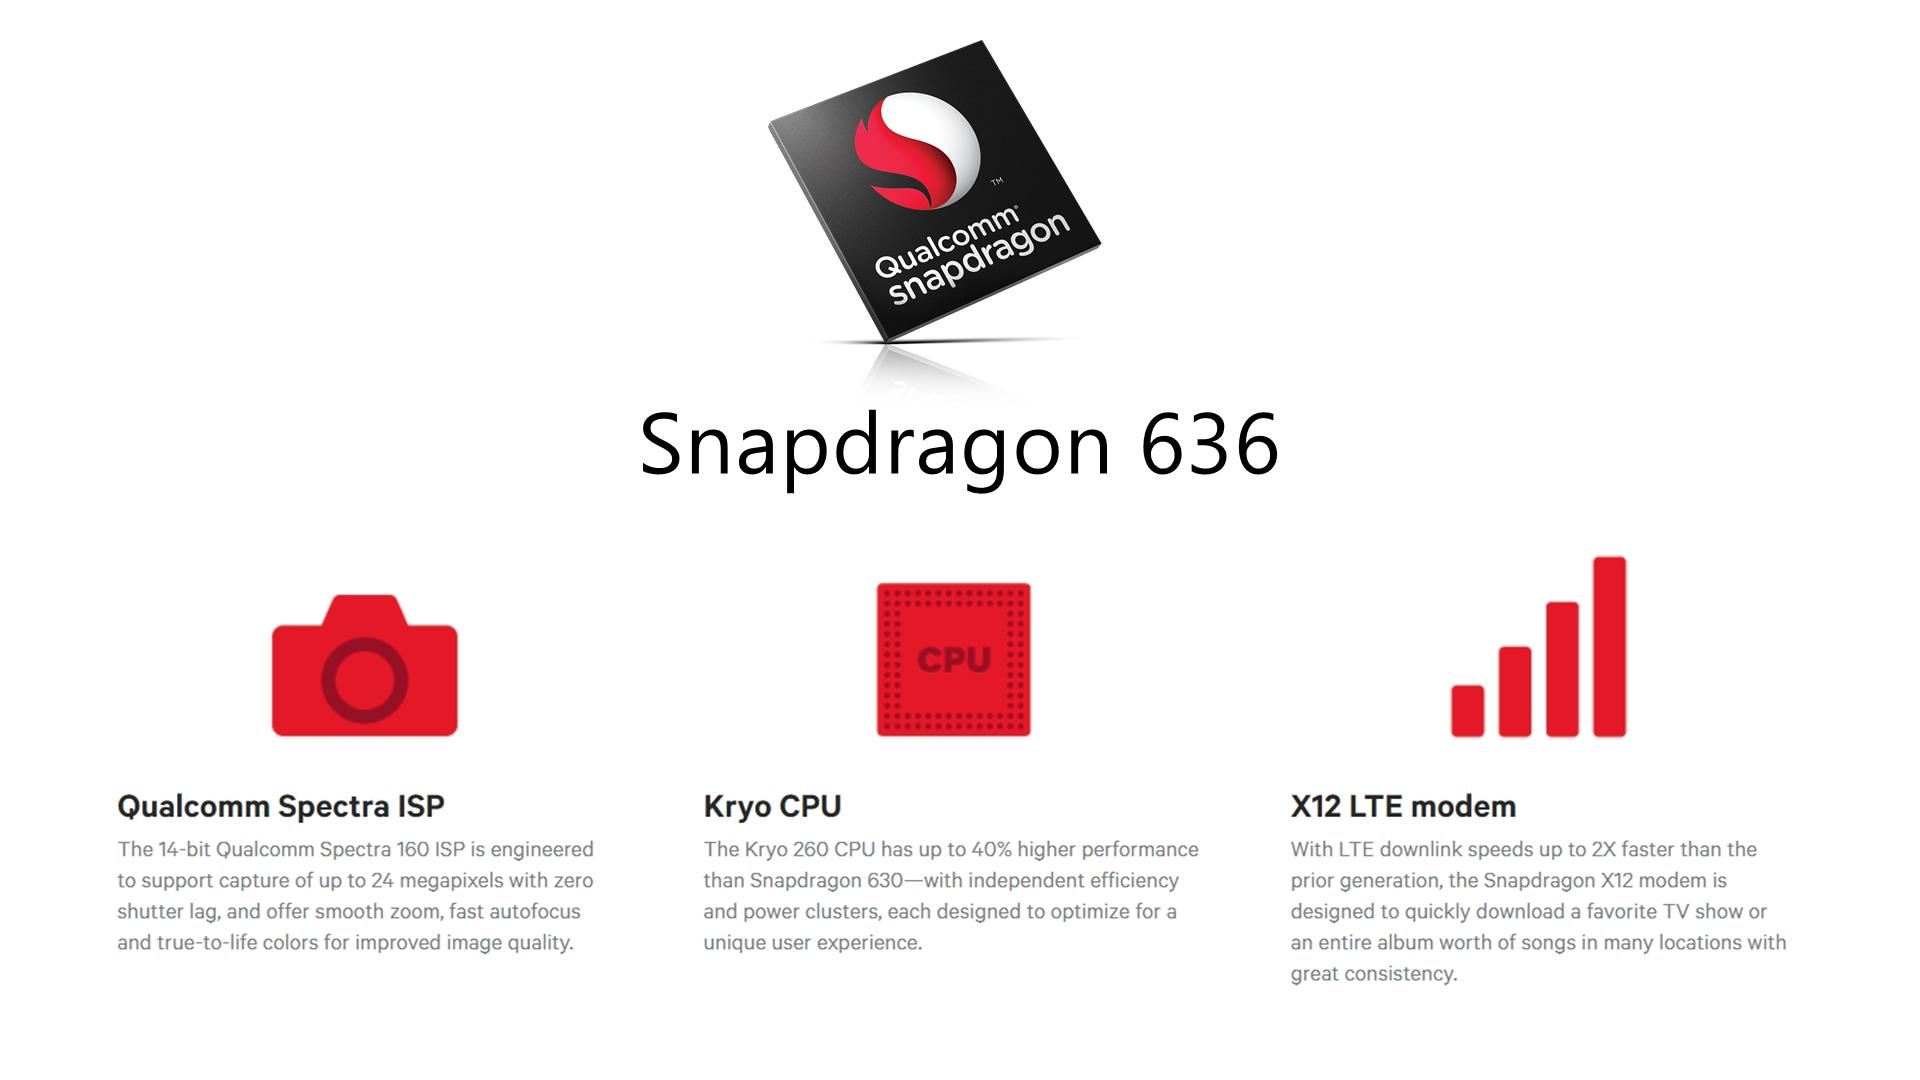 Kelebihan Snapdragon 636 2